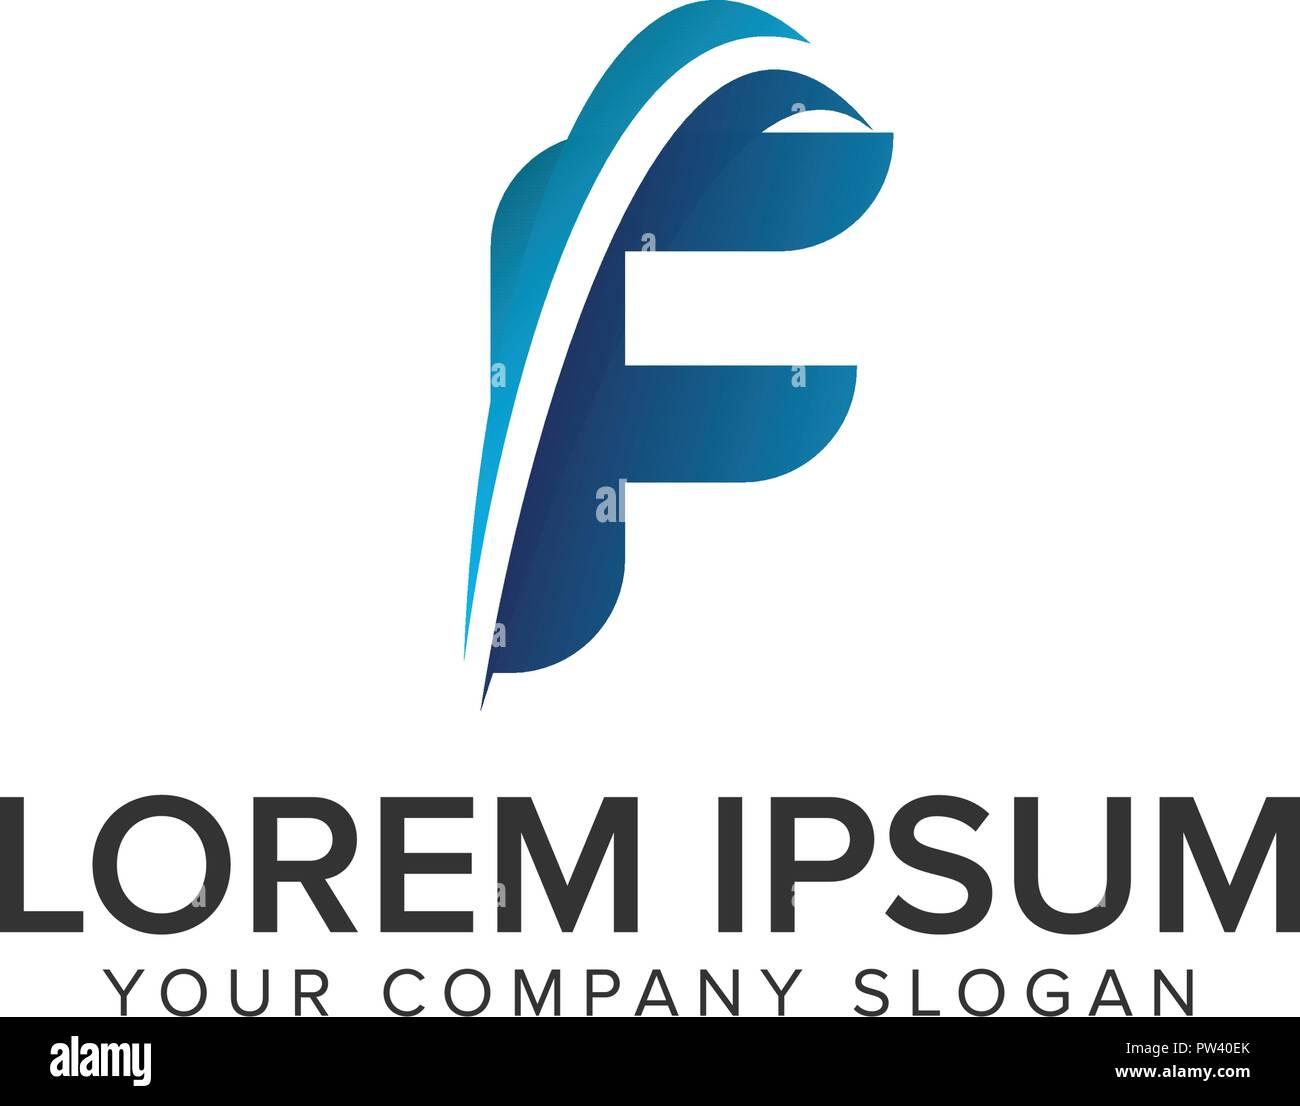 cative modern letter f logo design concept template fully editable